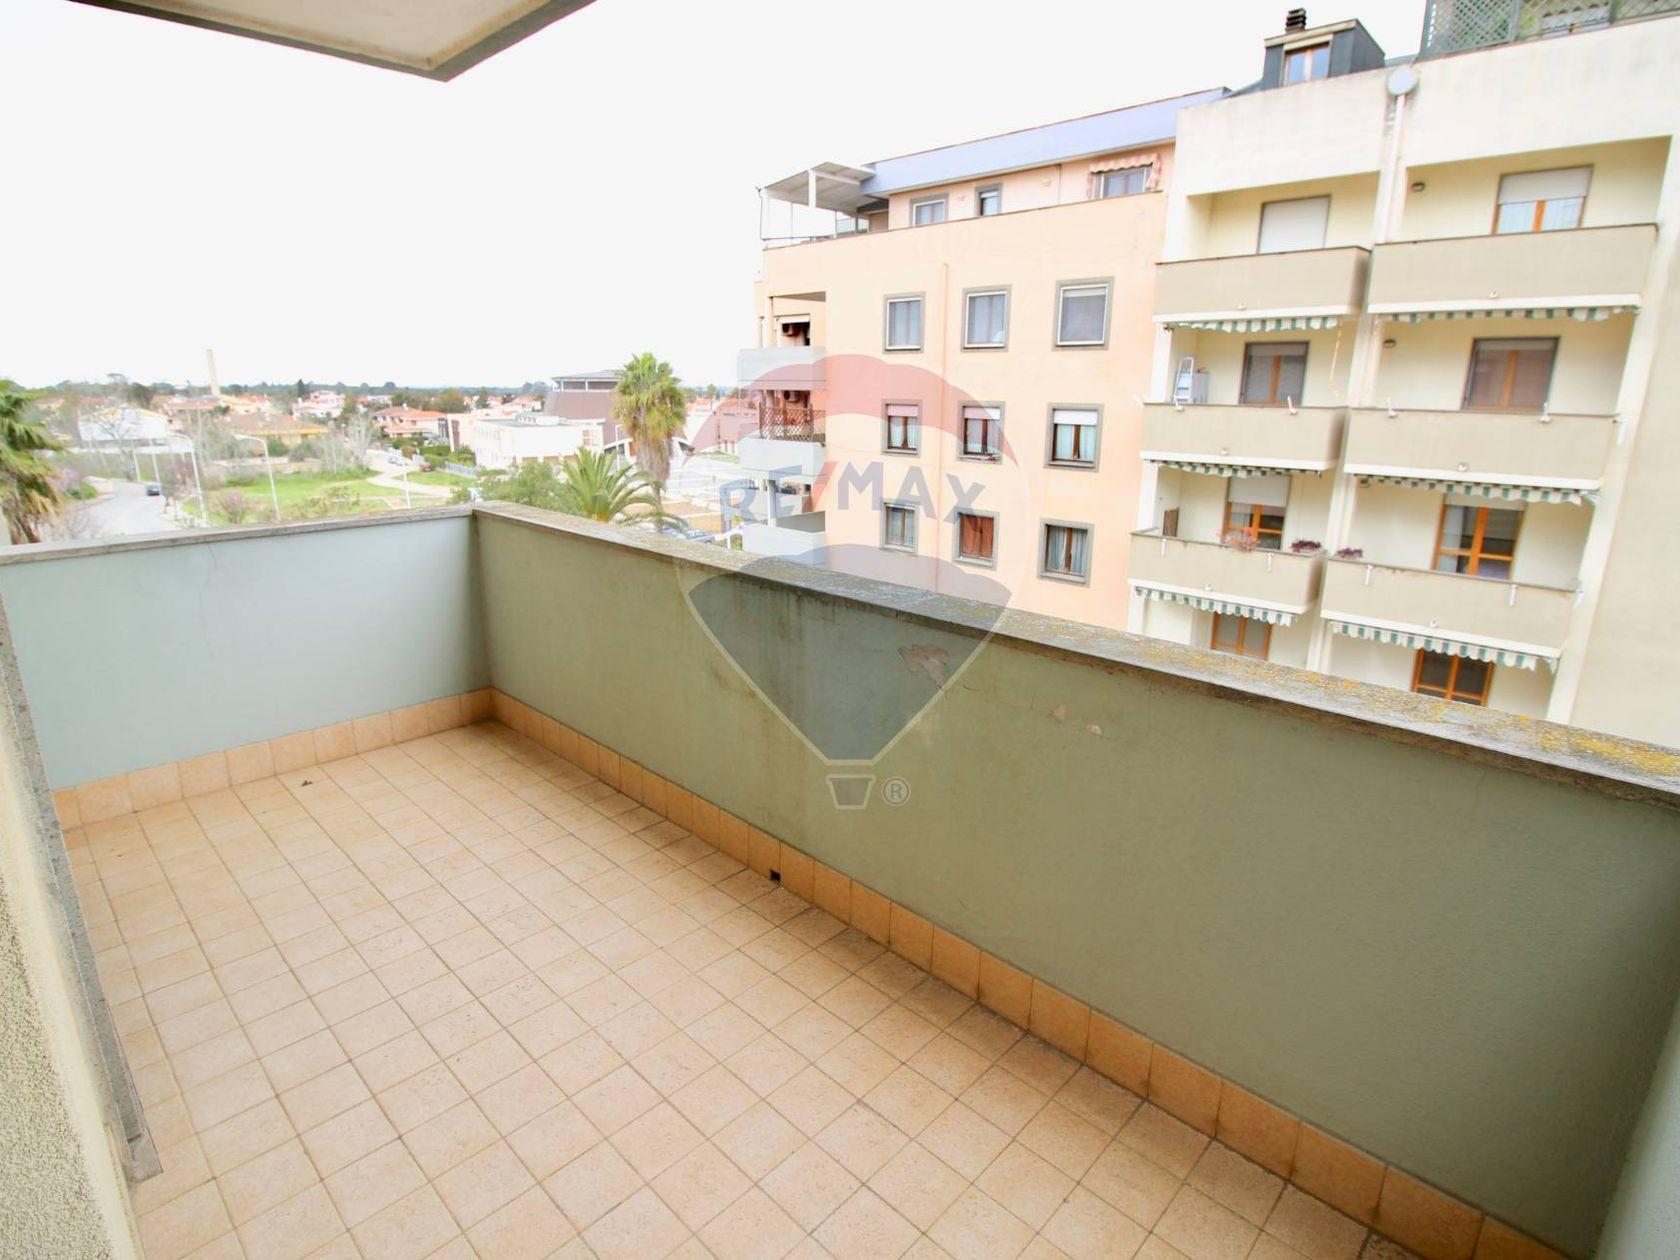 Appartamento Ss-s. Orsola Storica, Sassari, SS Vendita - Foto 4